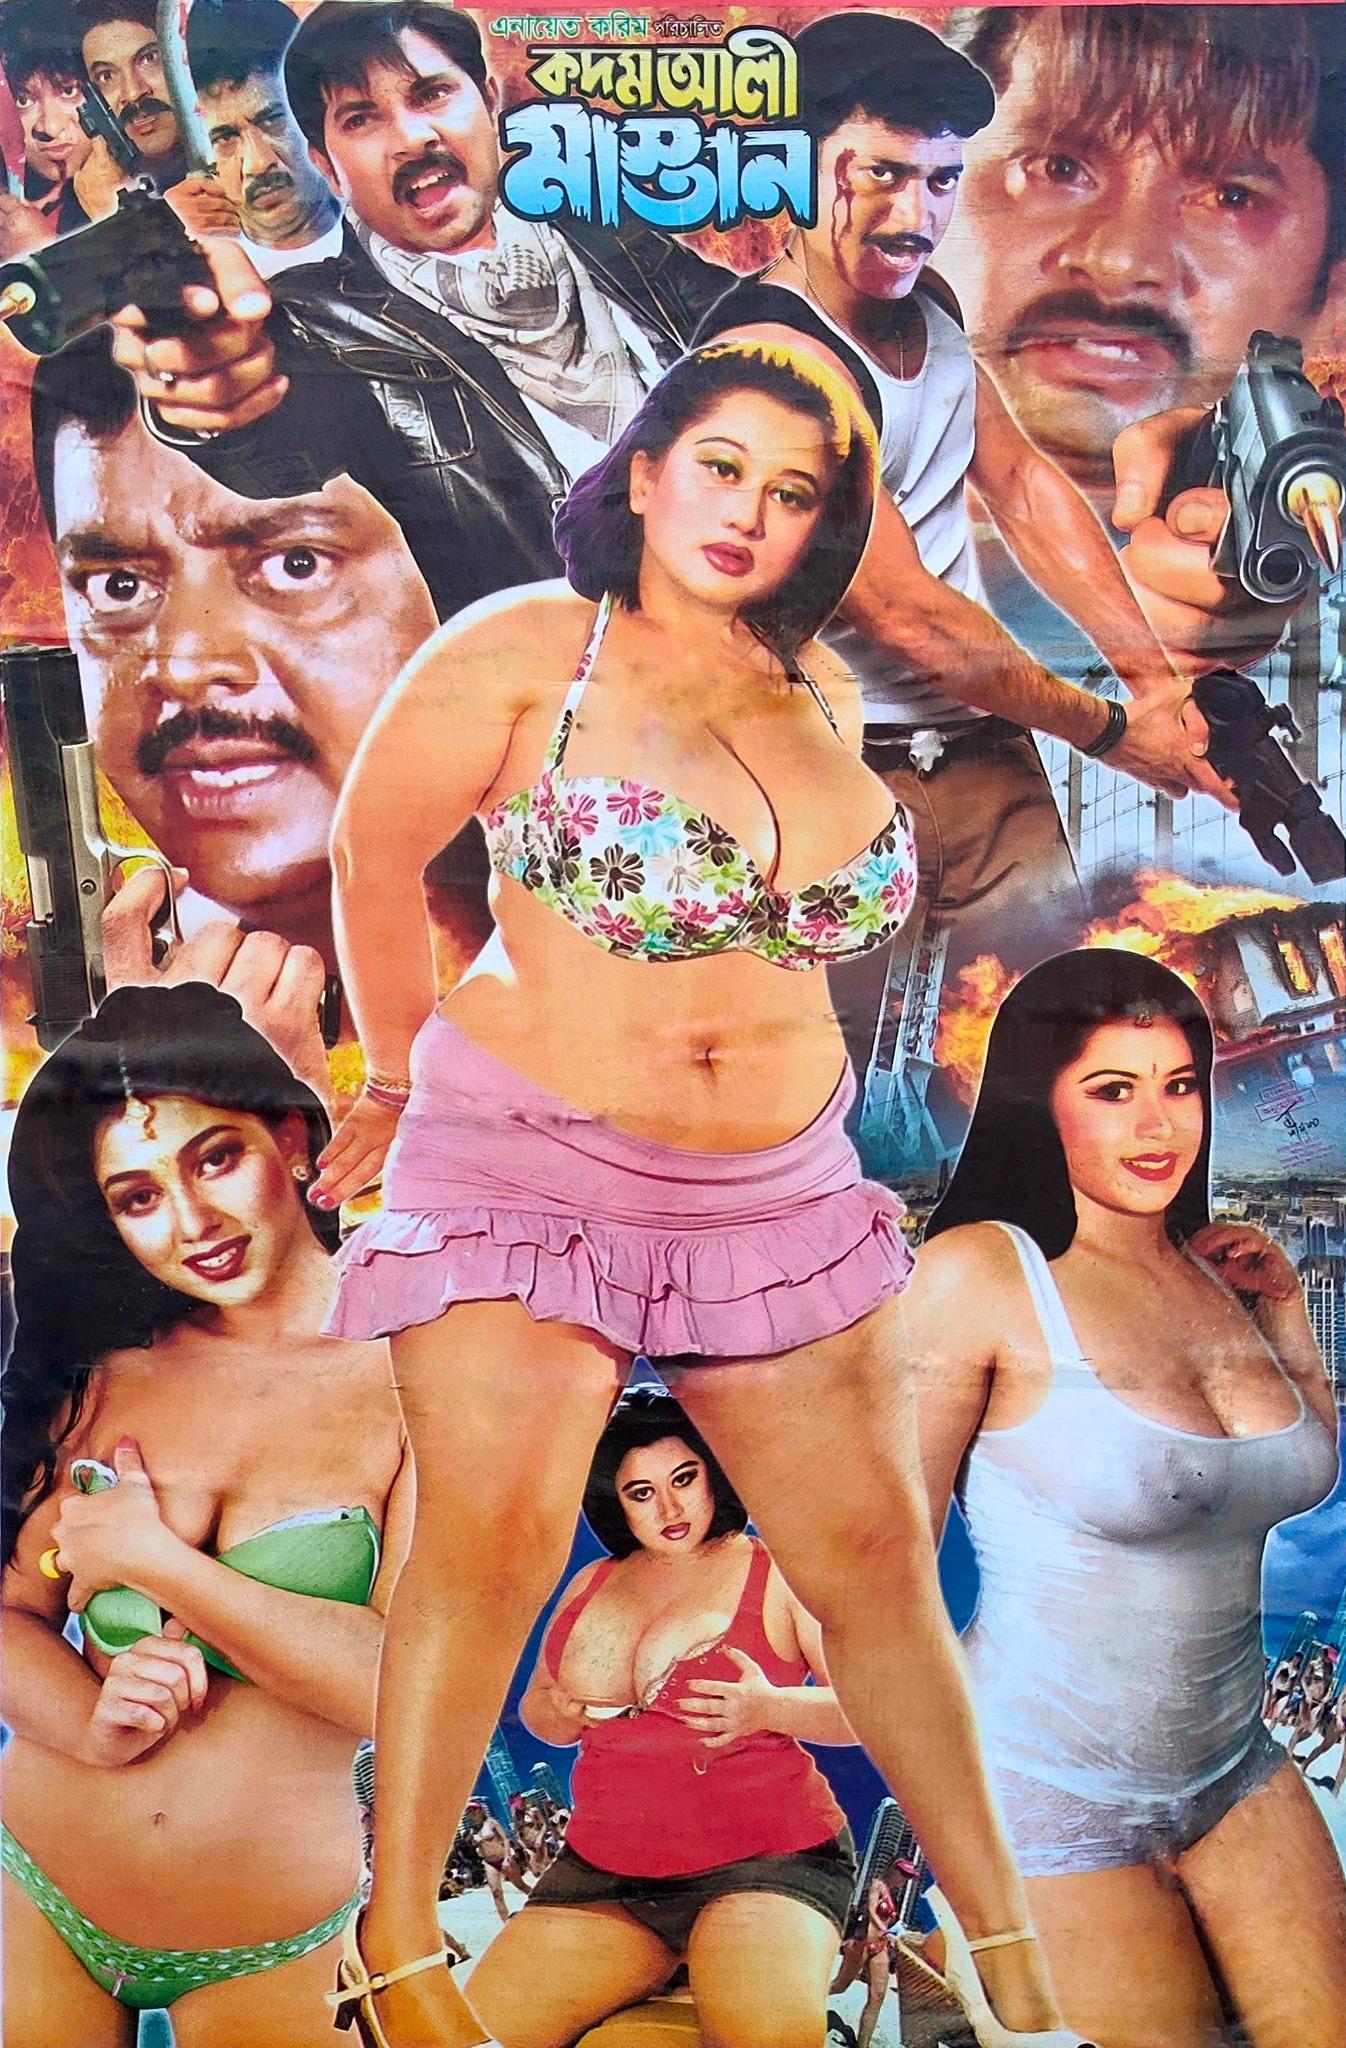 18+ Kodom Ali Mastan 2021 Bangla Hot Movie 720p HDRip 700MB Download